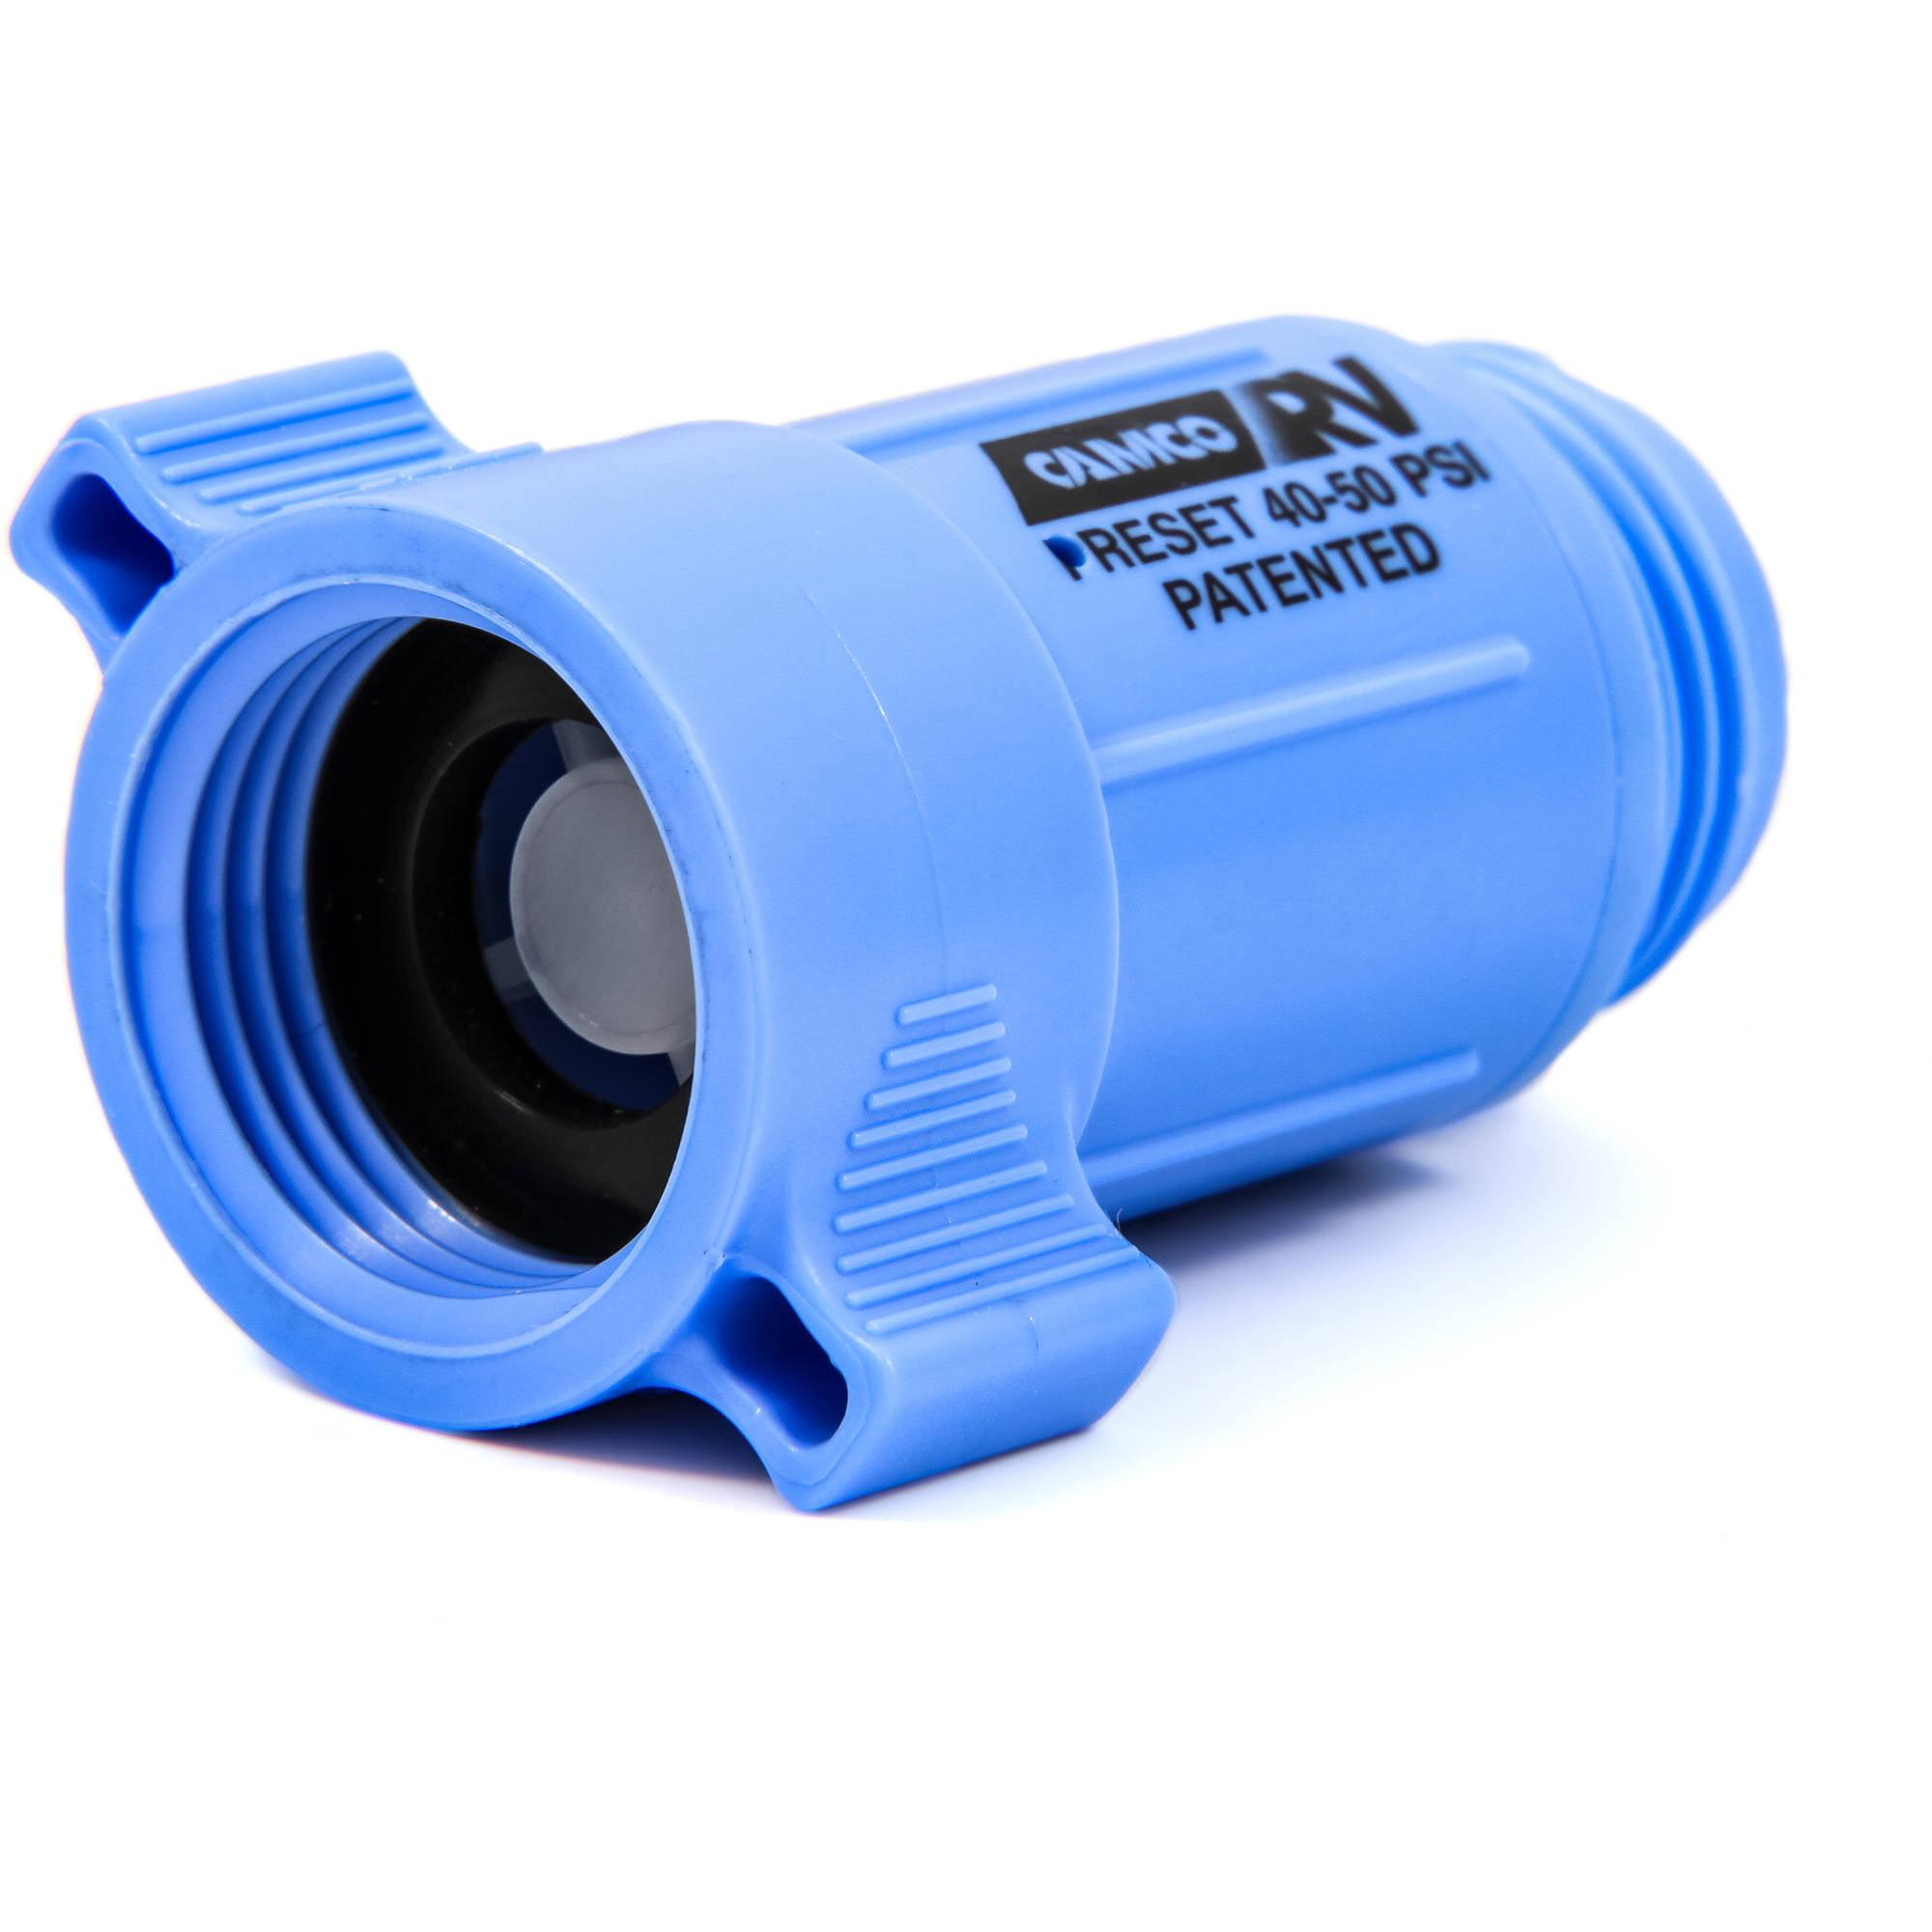 Camco 40143-X RV Plastic Water Pressure Regulator